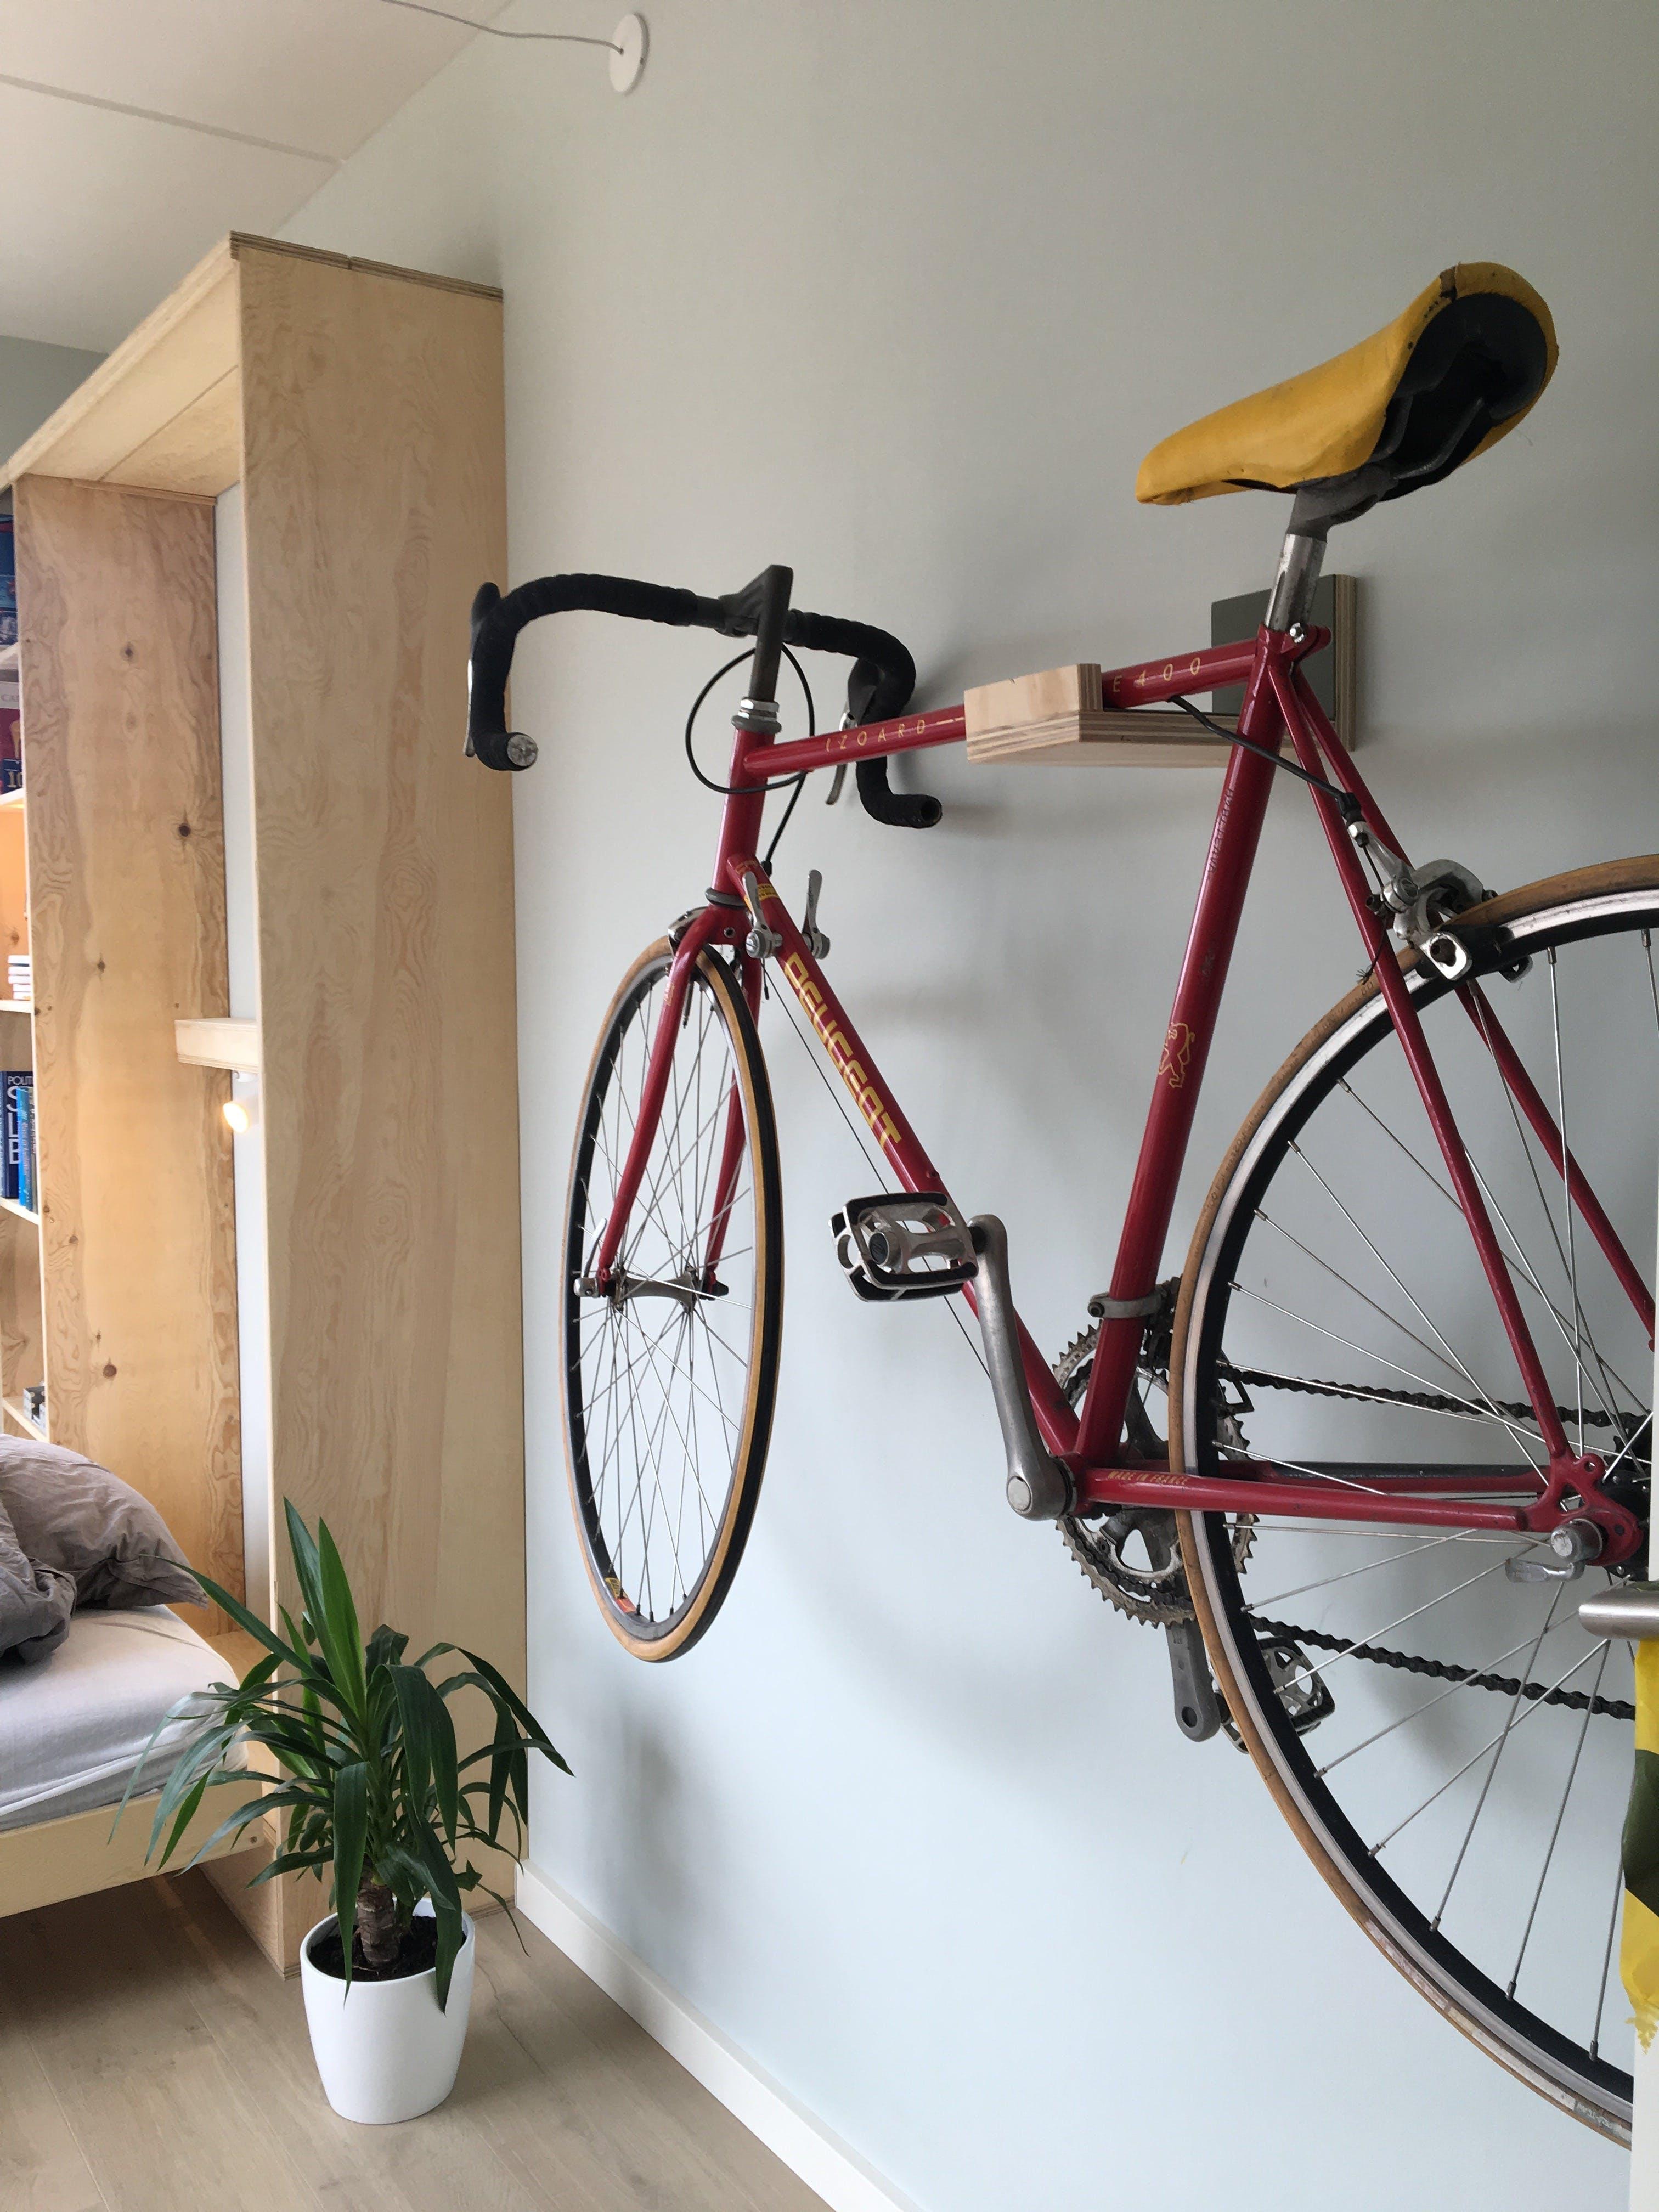 Nybyggerne gæsteværelse cykel cykelophæng Maria & Kristian